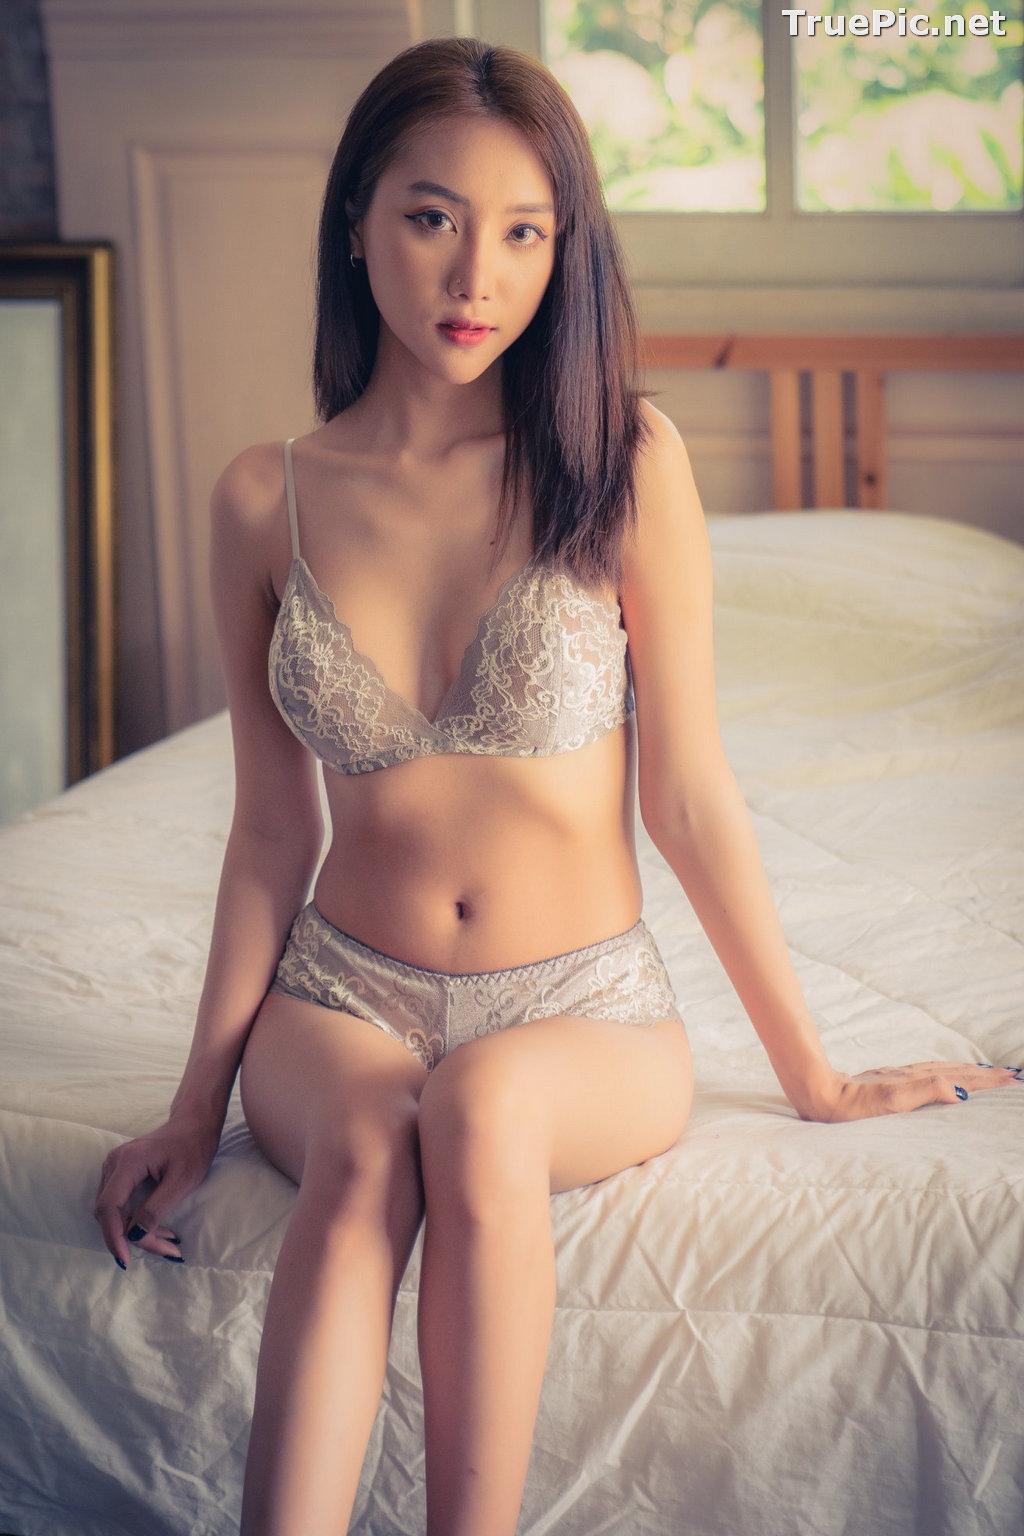 Image Thailand Model – Piyatida Rotjutharak (น้องตาร์) – Beautiful Picture 2021 Collection - TruePic.net - Picture-8